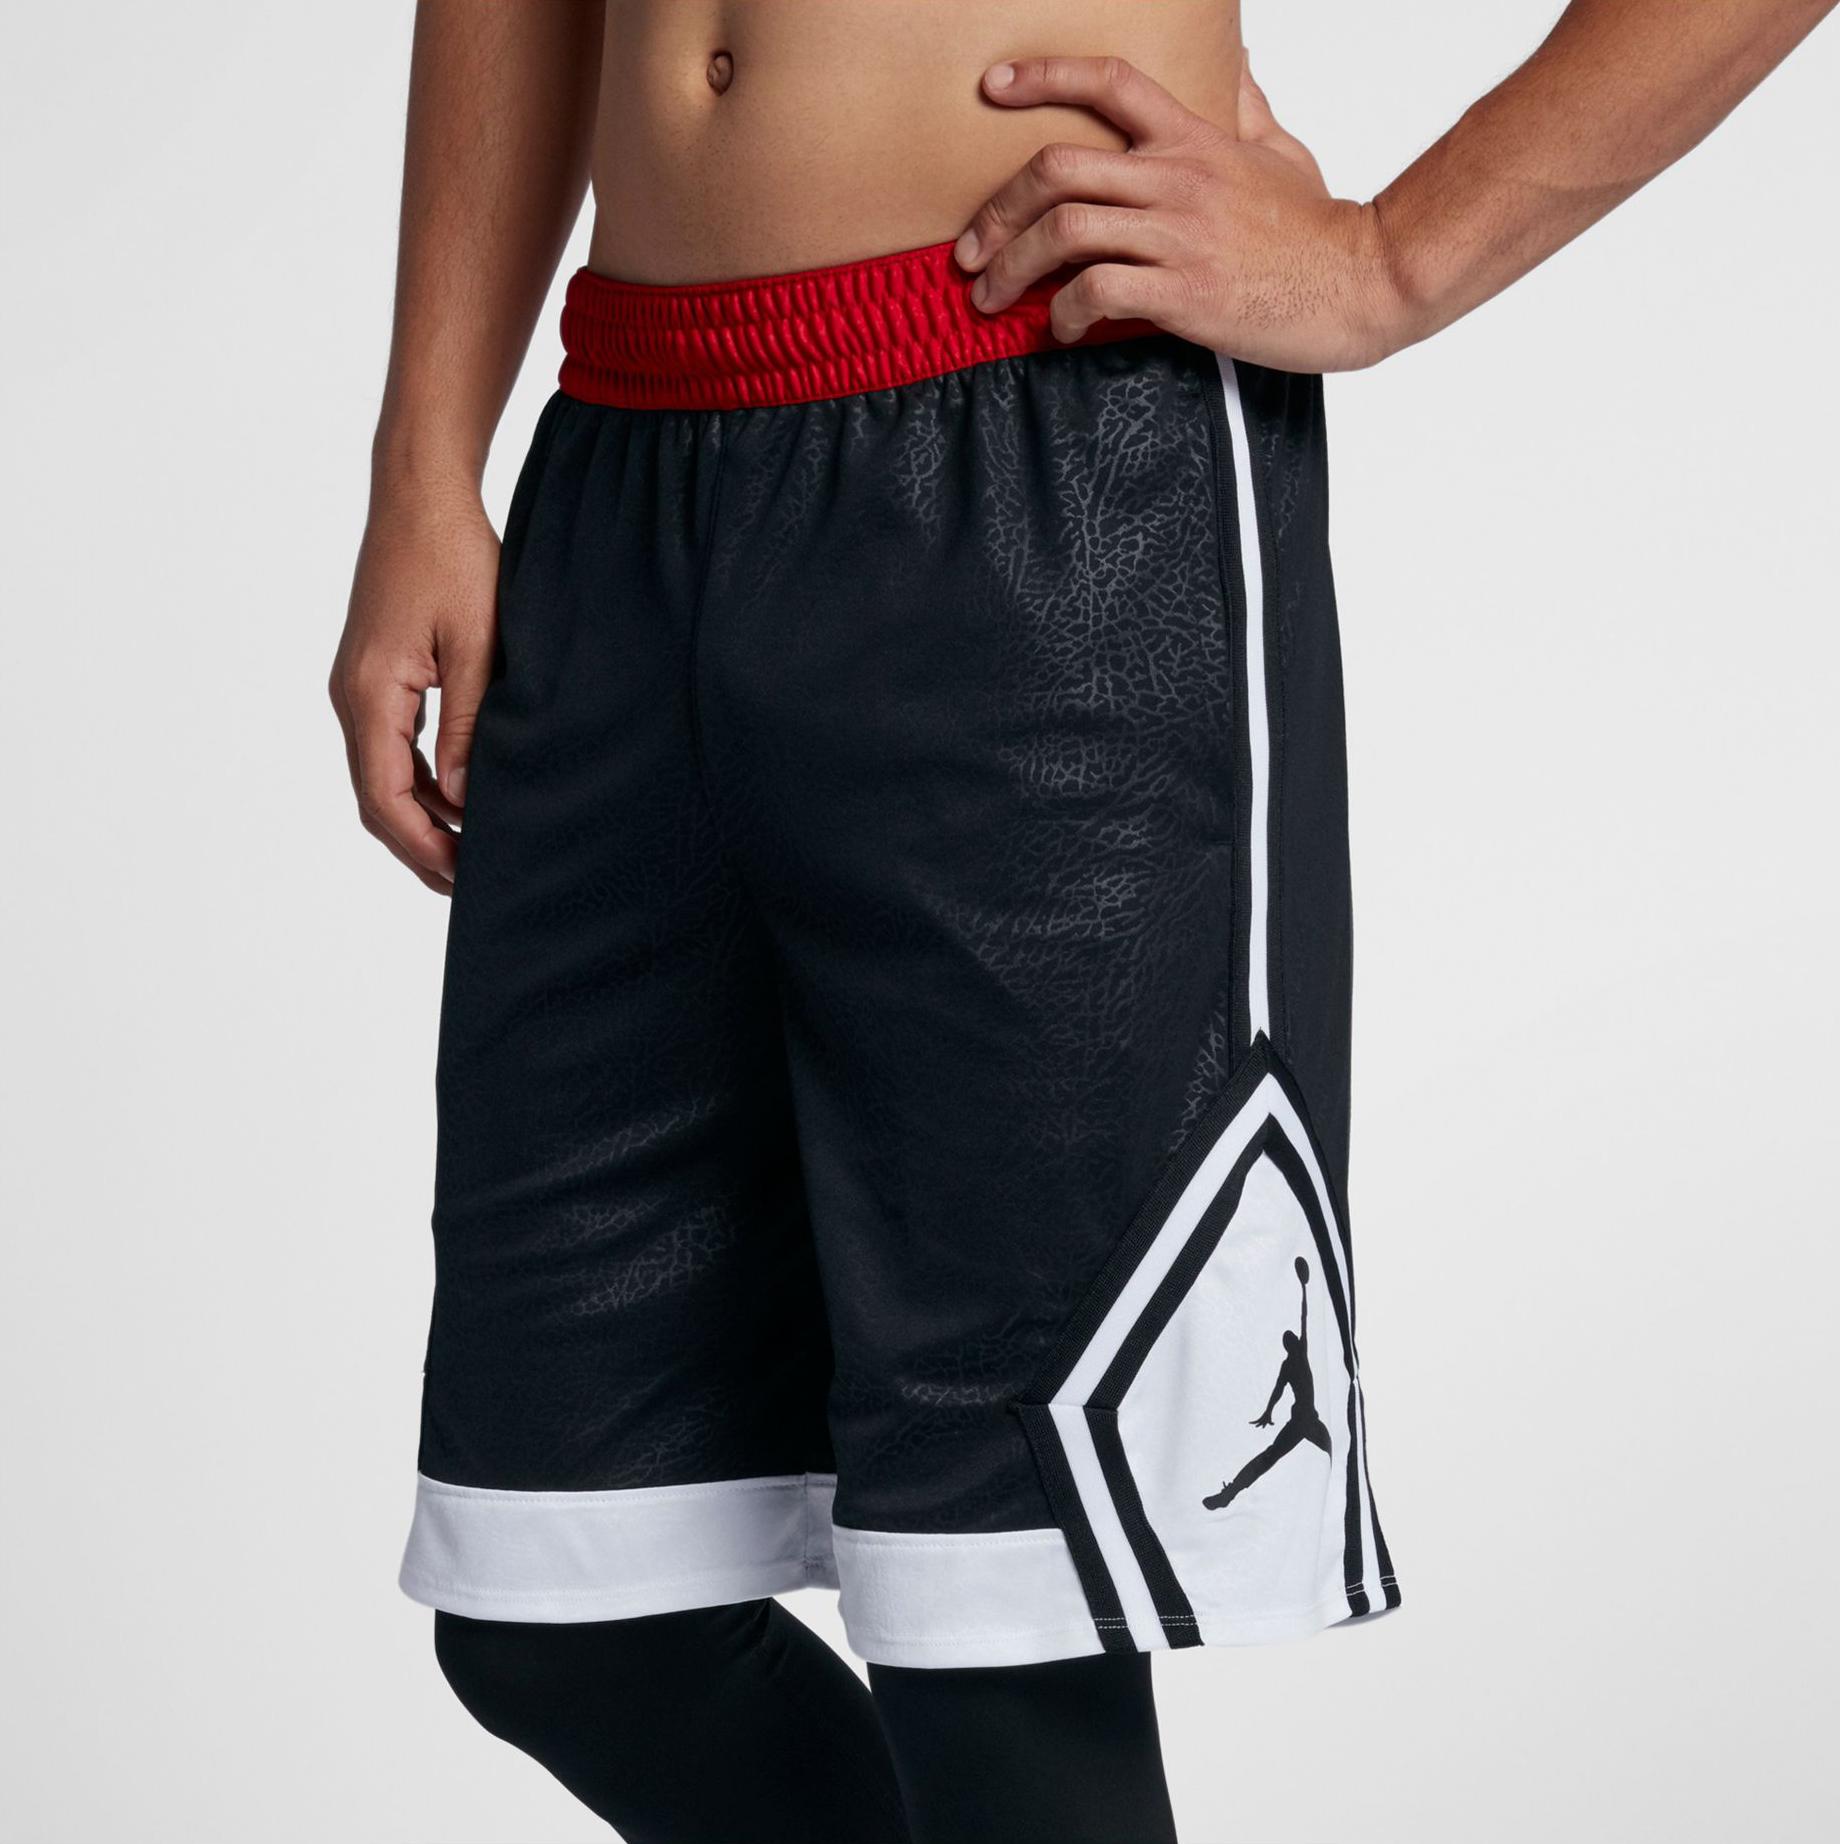 jordan-3-black-cement-shorts